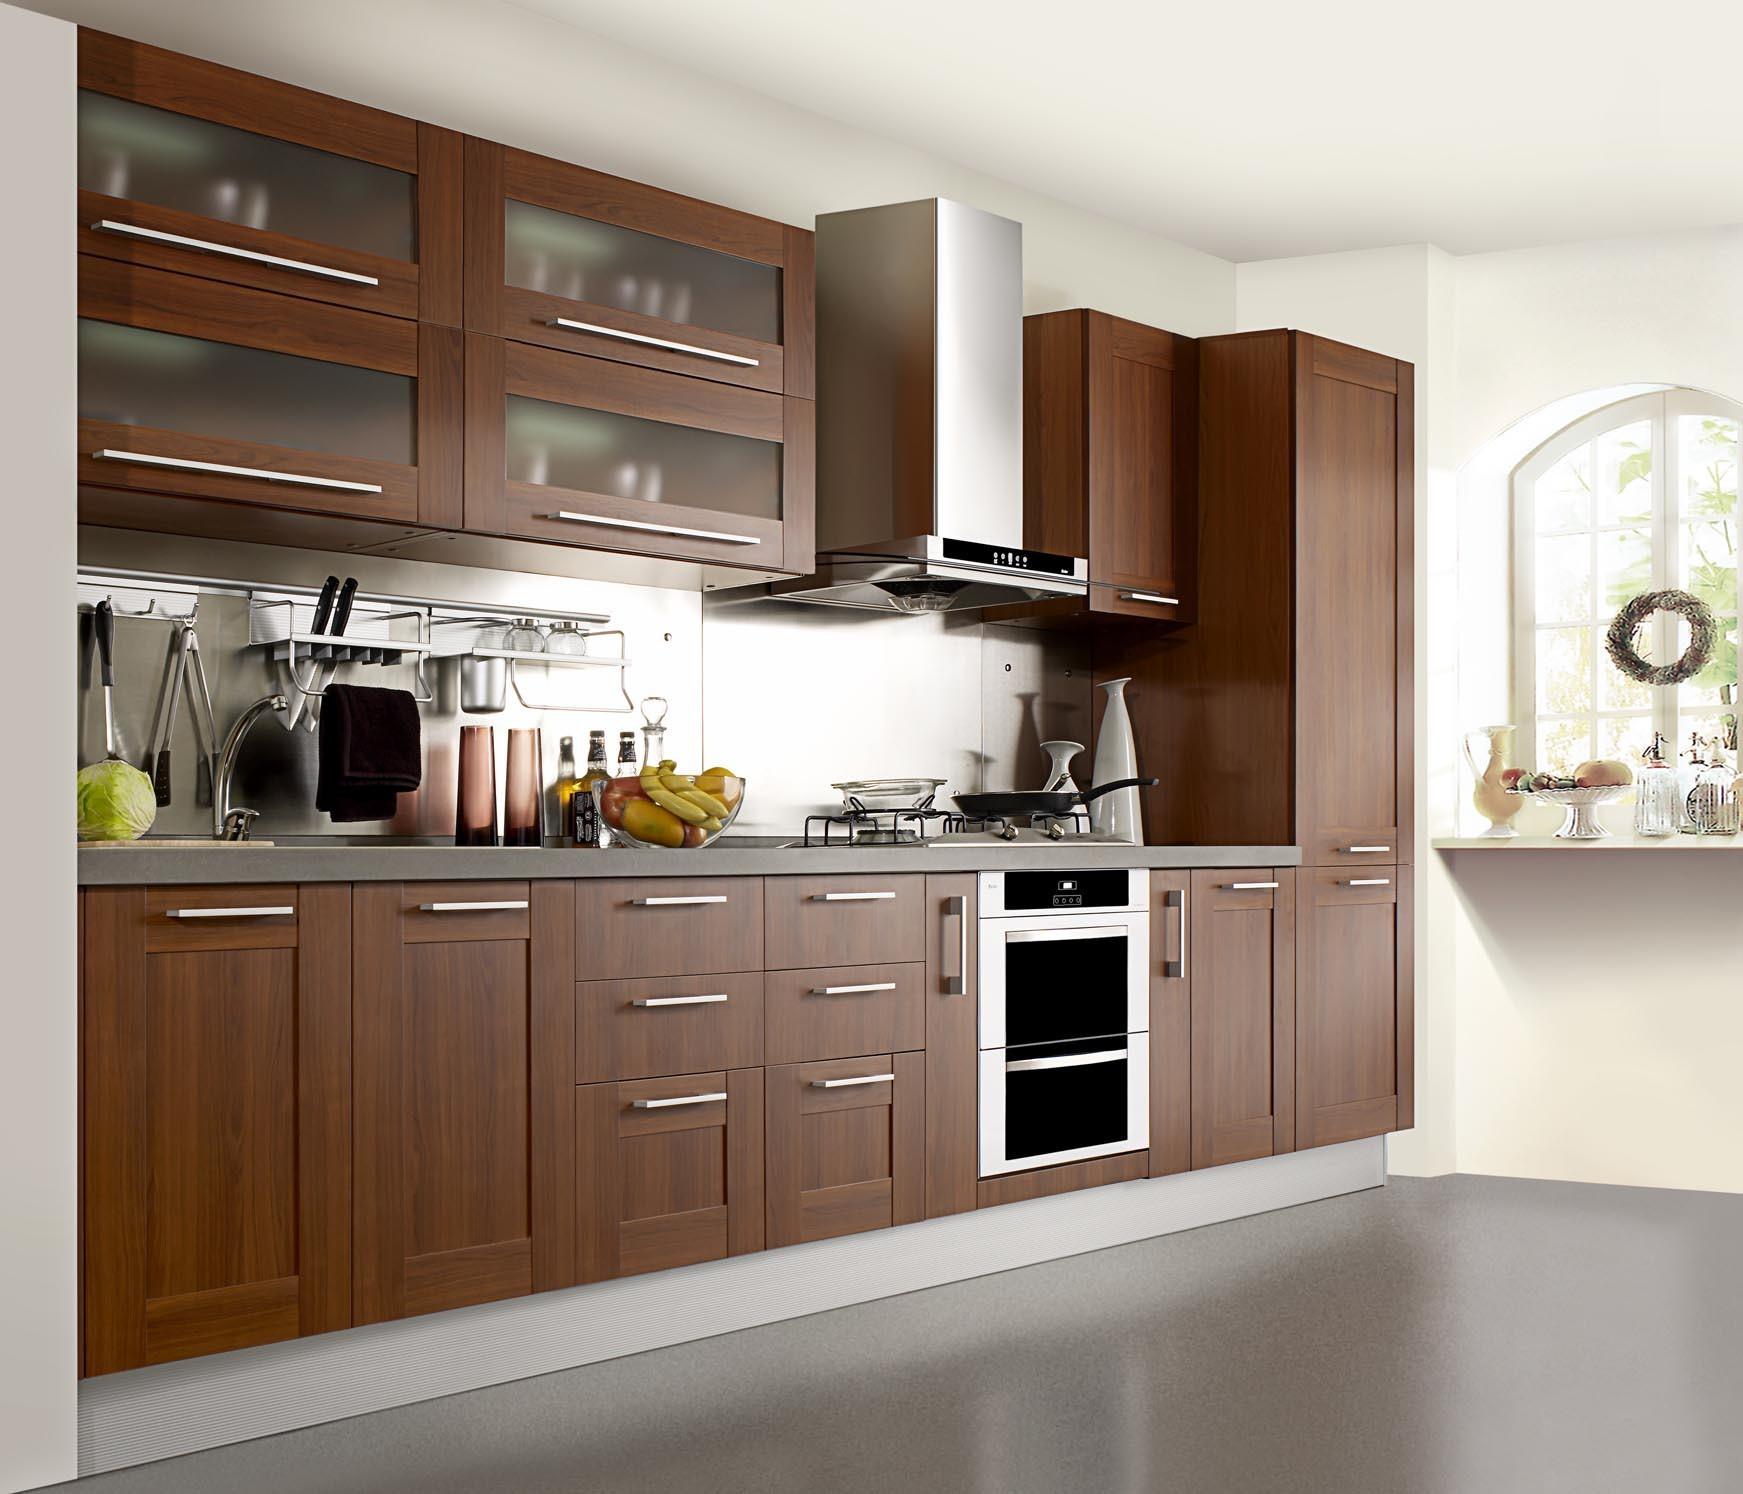 China Natural Oak Wood Veneer Kitchen Furniture solid wood kitchen cabinets Natural Oak Wood Veneer Kitchen Furniture